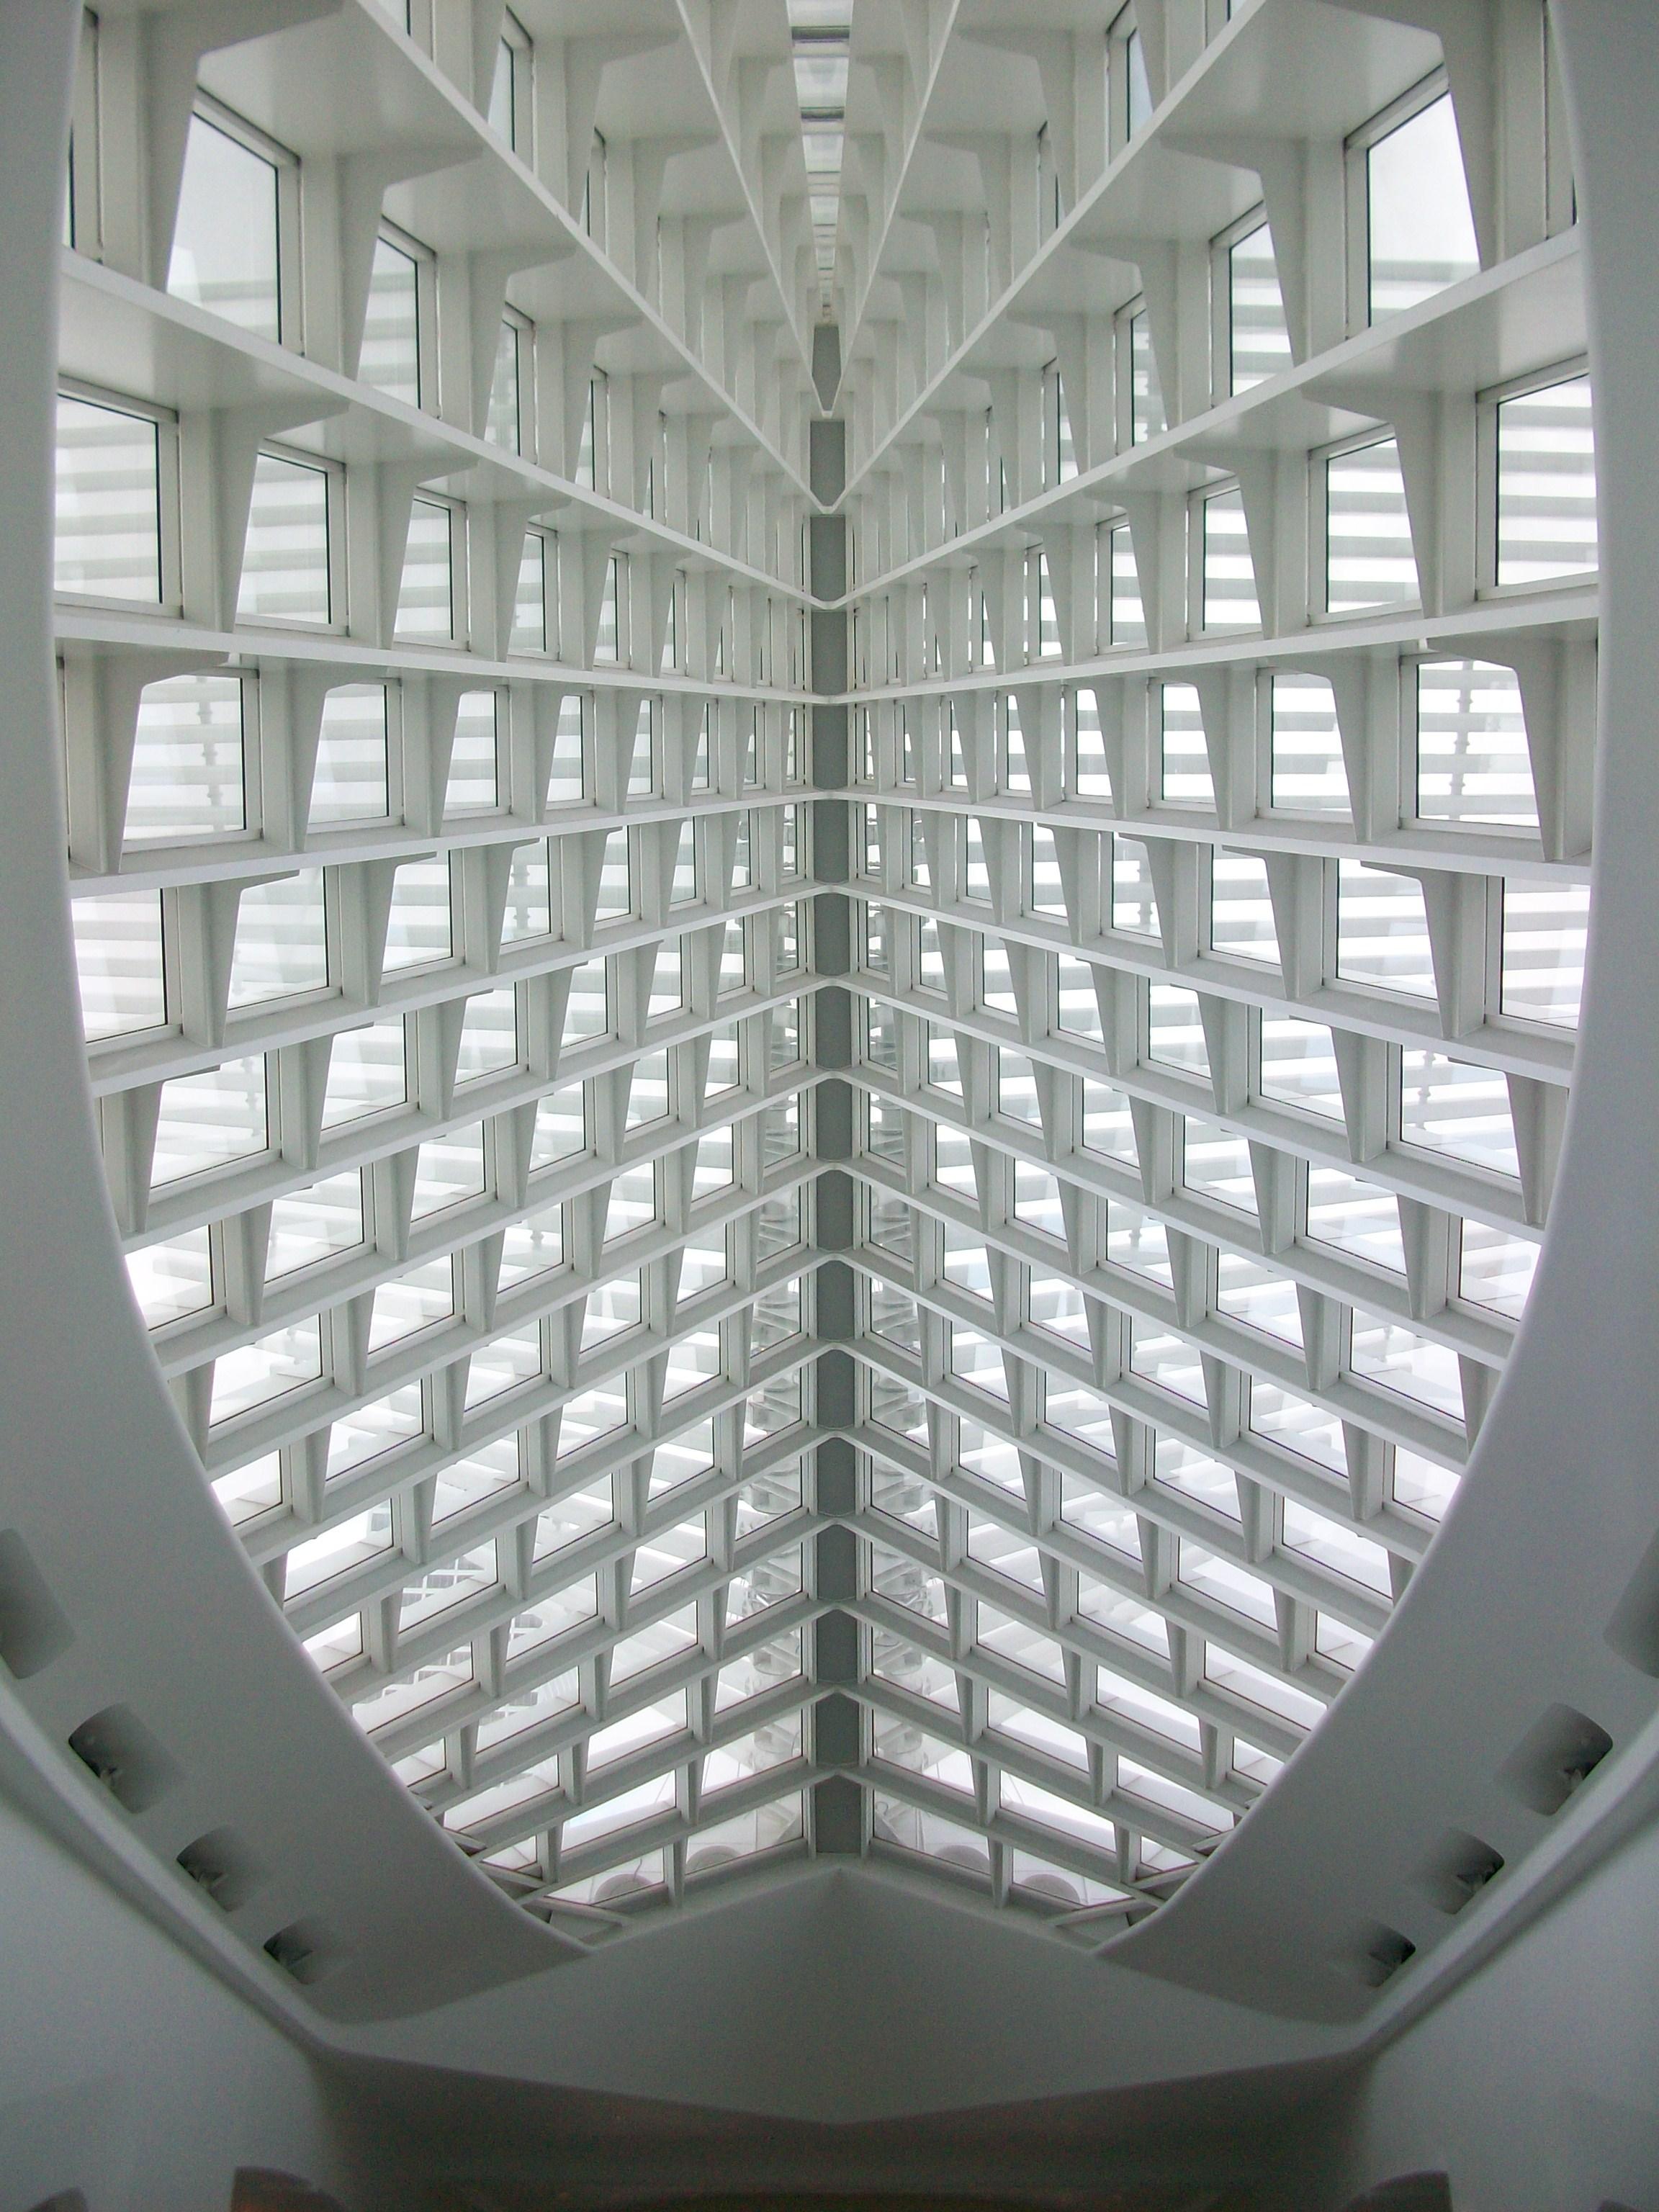 Calatrava's Milwaukee Art Museum View of the Closed Sunscreen from Inside